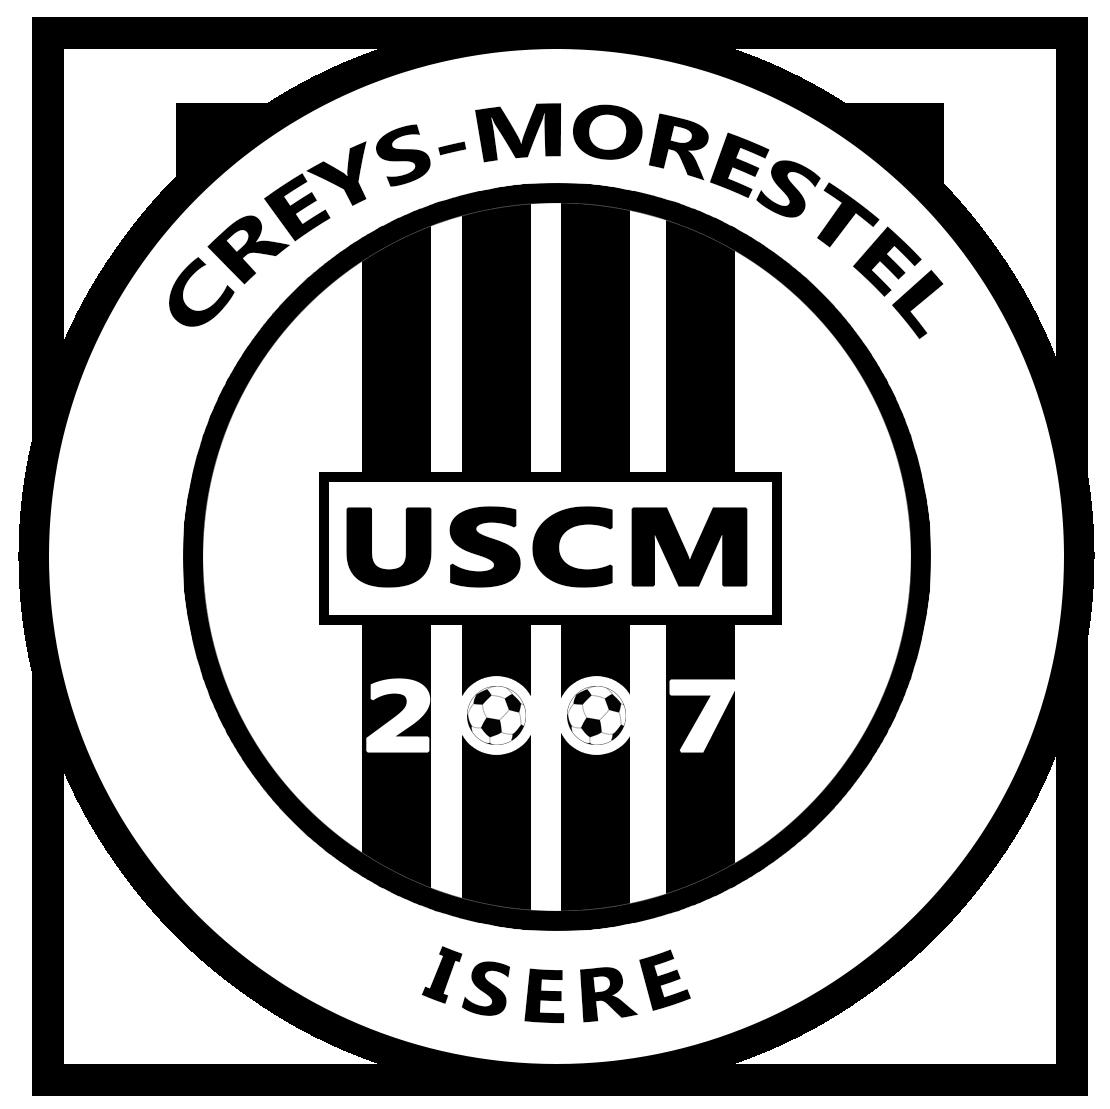 uscm.png